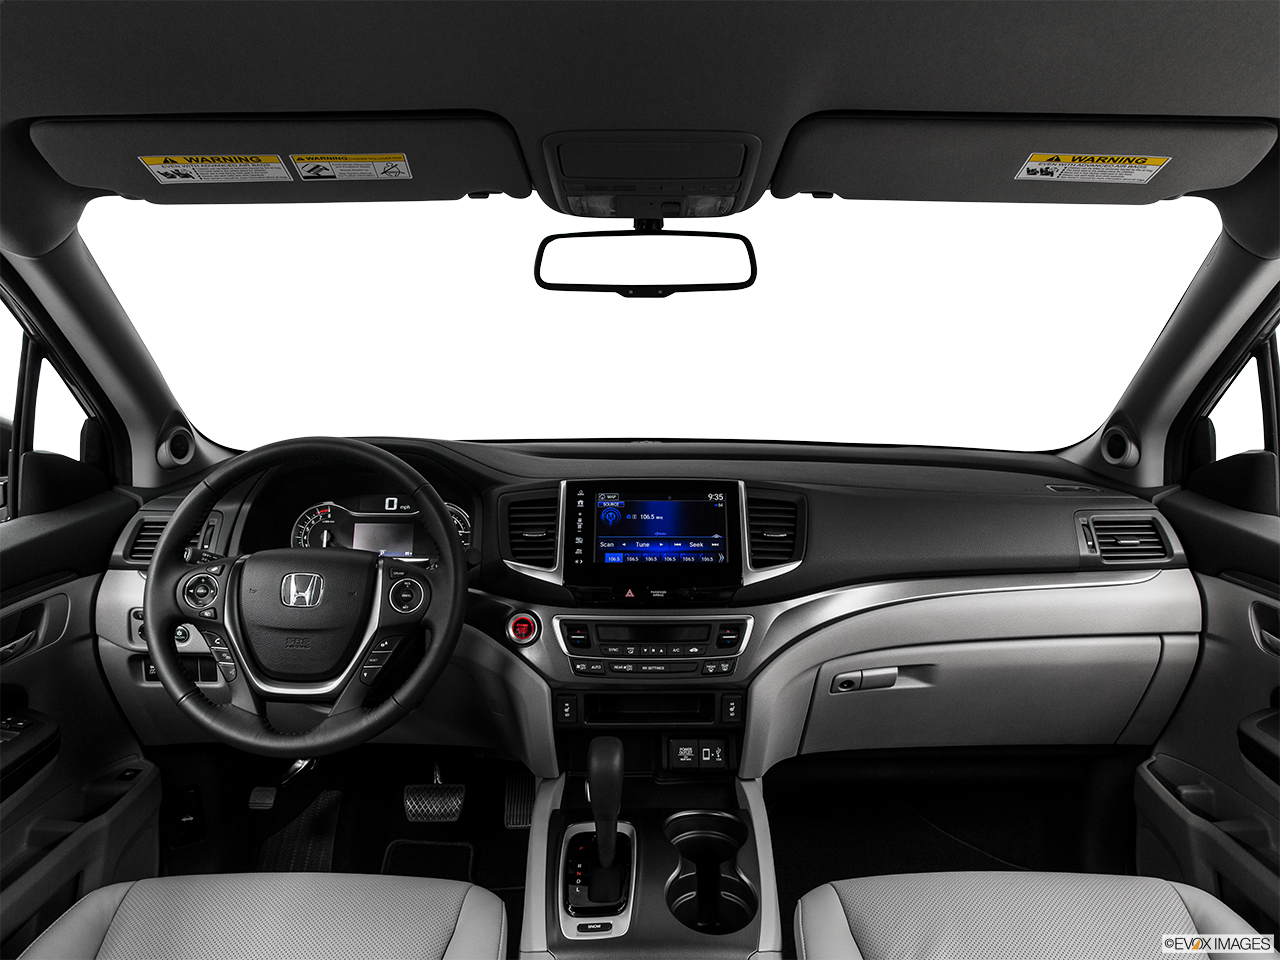 Interior View Of 2017 Honda Ridgeline near San Diego